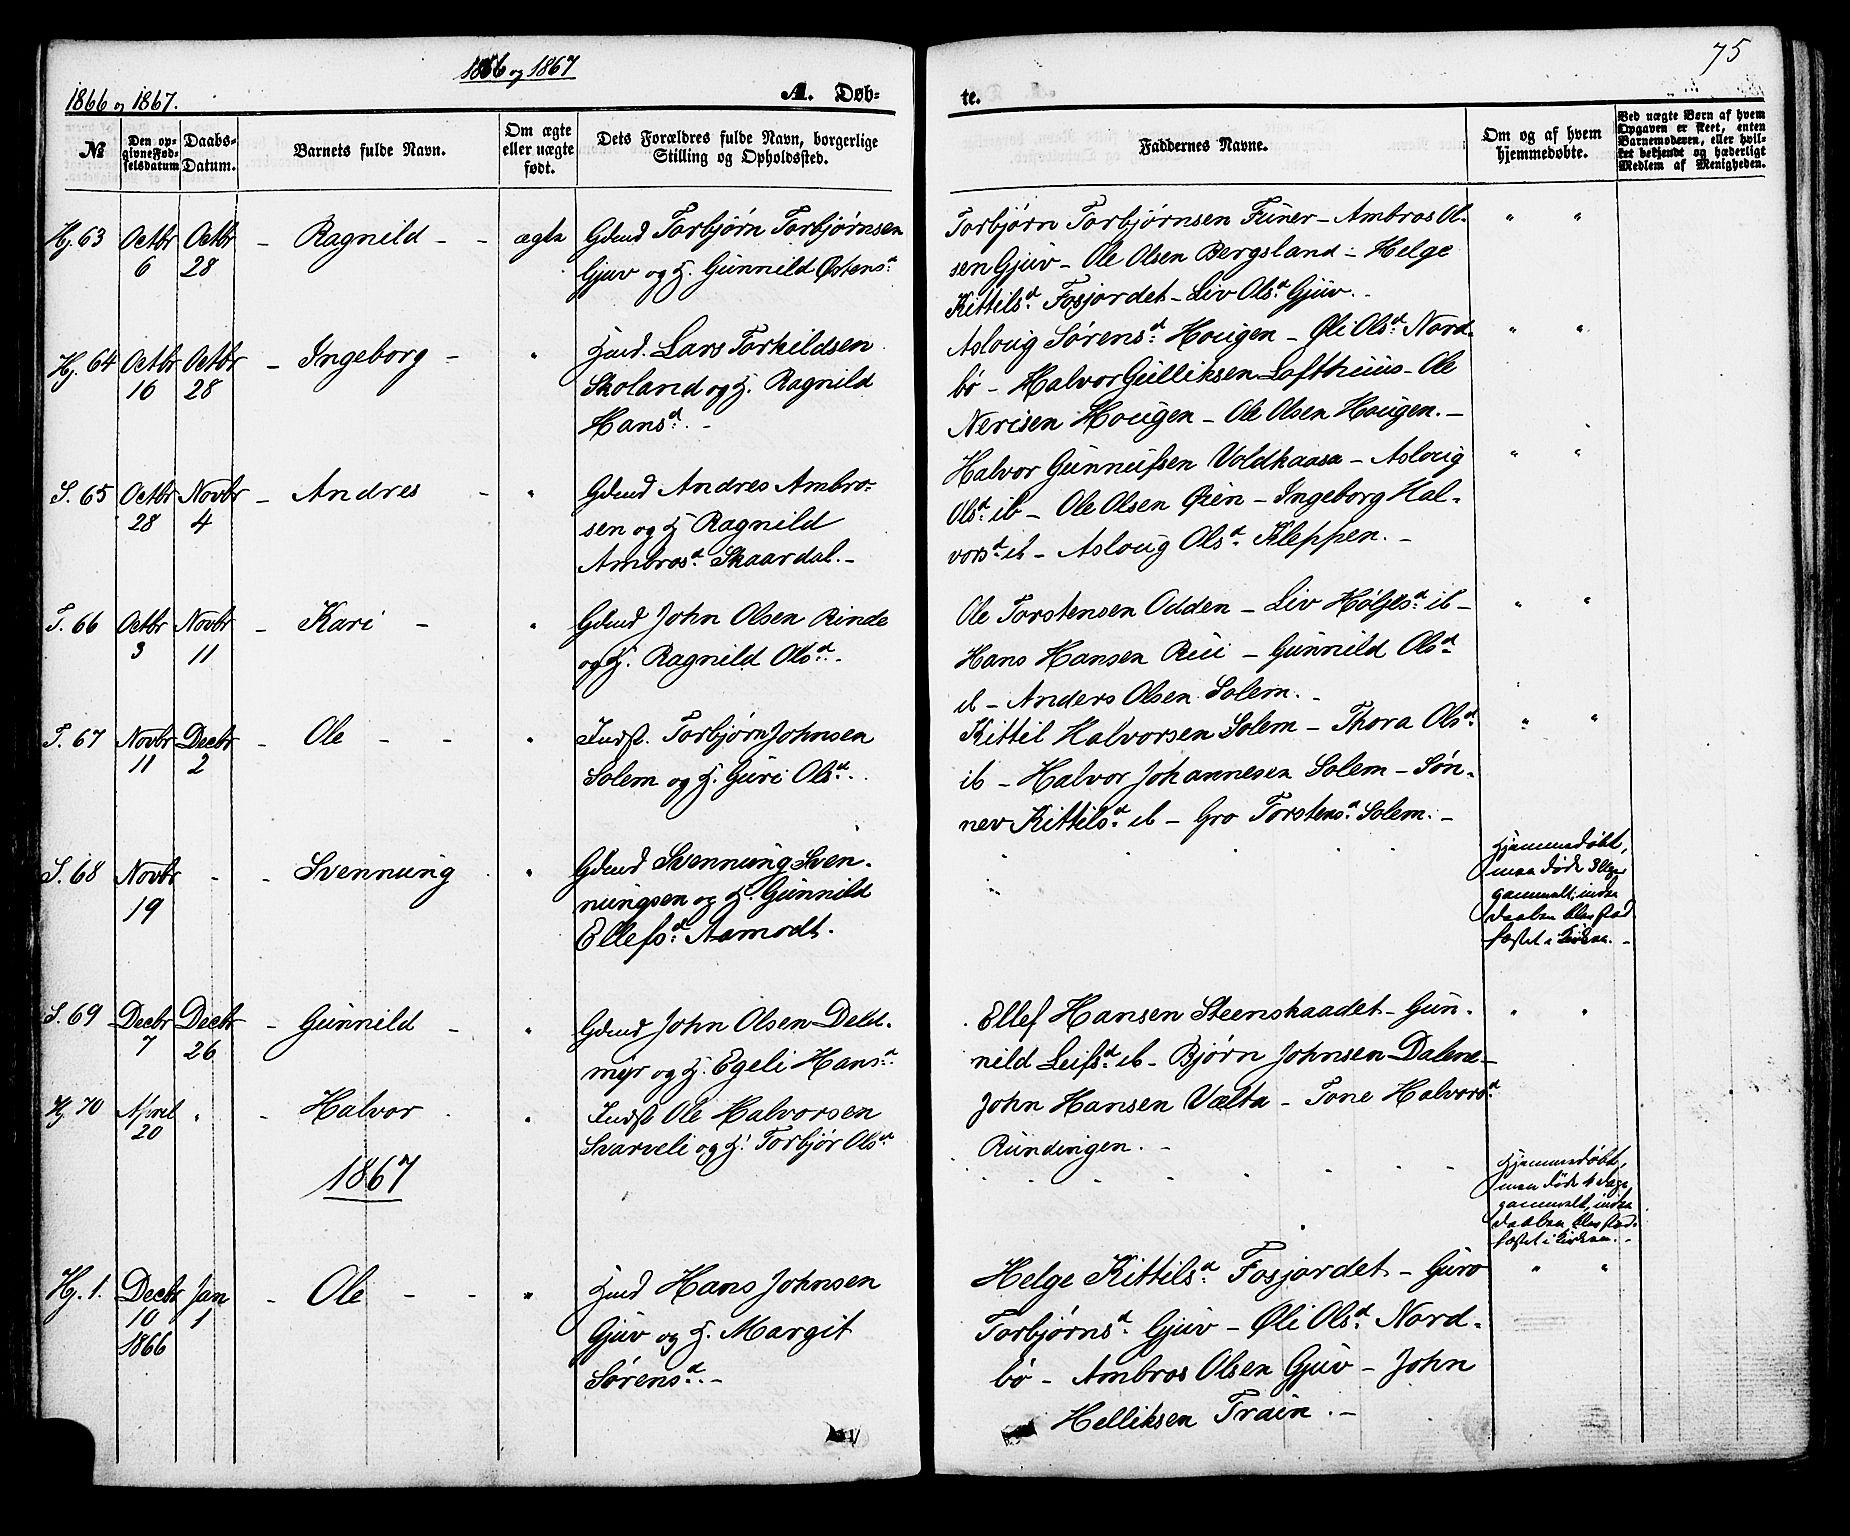 SAKO, Hjartdal kirkebøker, F/Fa/L0009: Ministerialbok nr. I 9, 1860-1879, s. 75